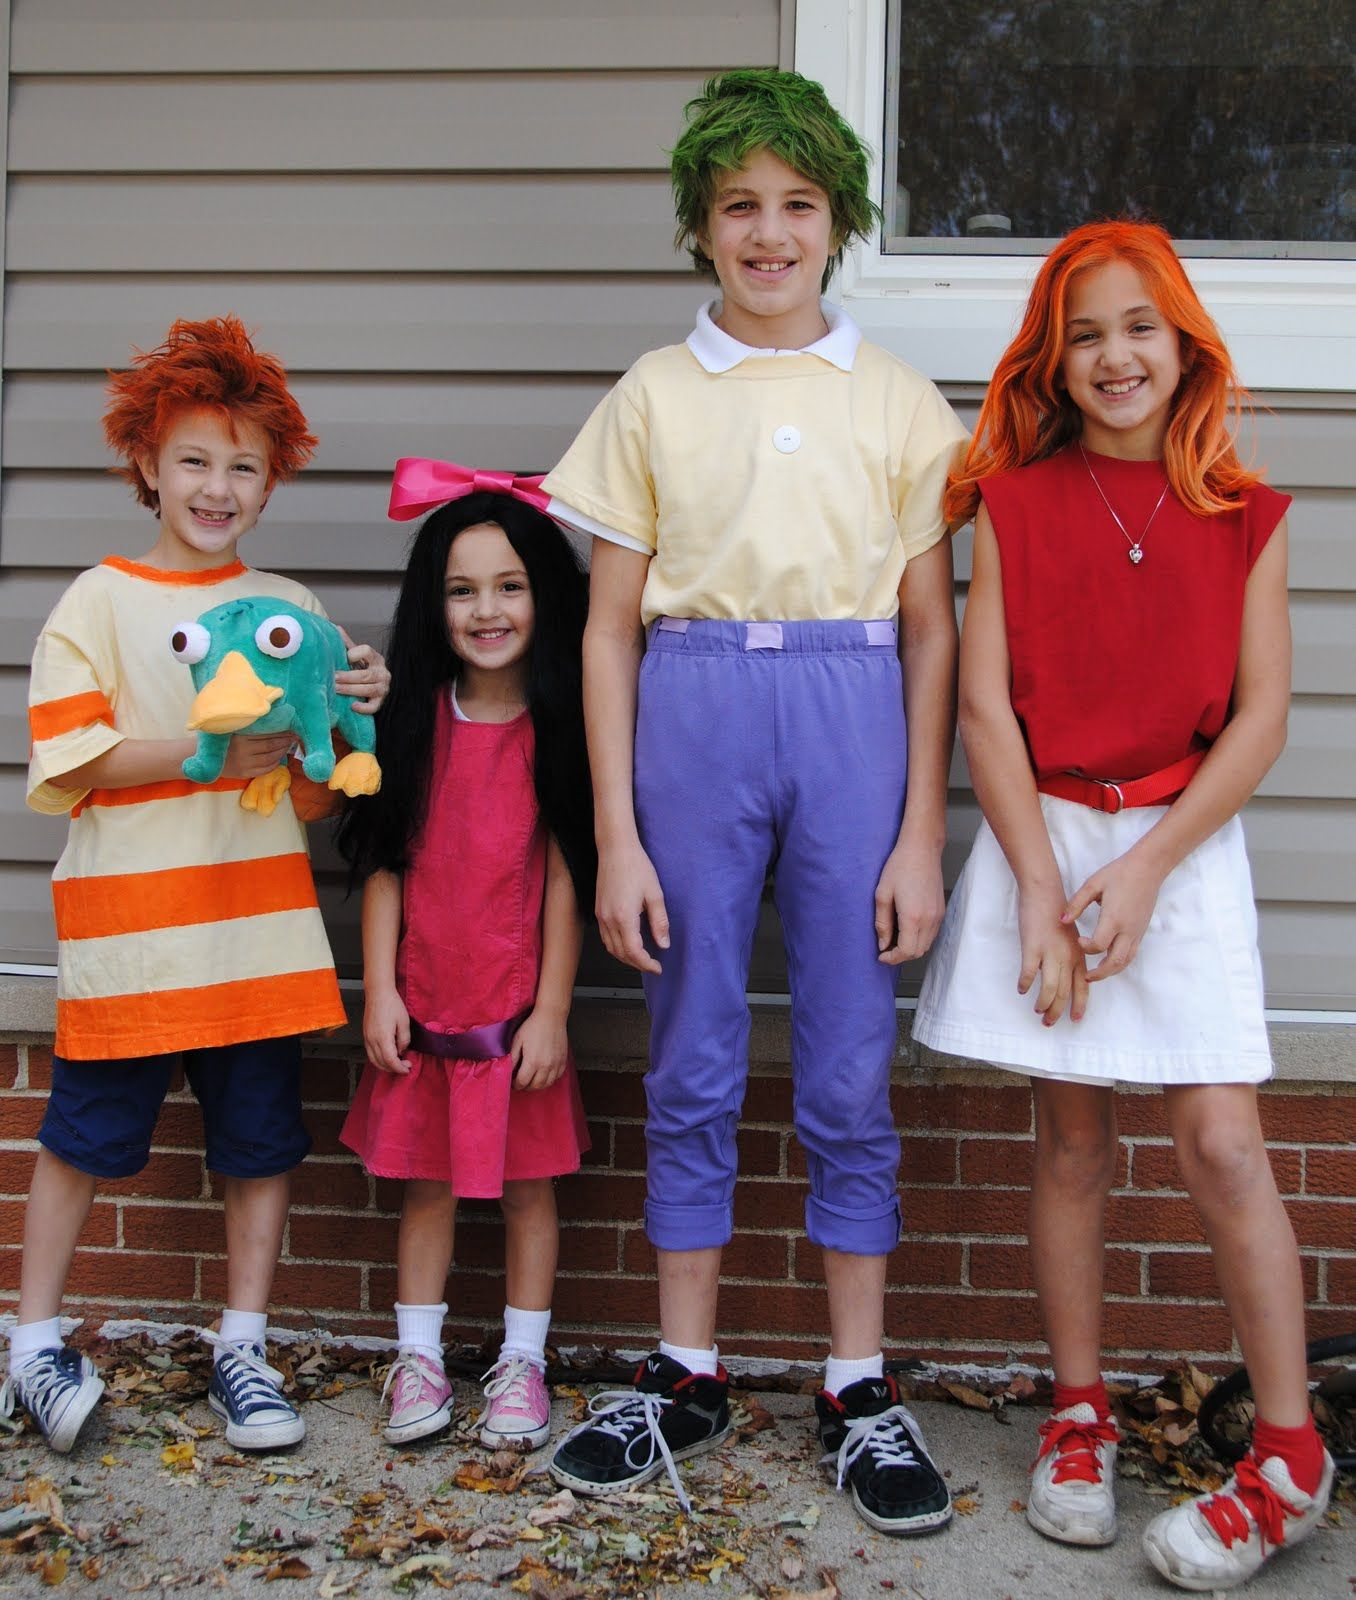 brilliant!- phineas and ferb! | halloween | pinterest | halloween